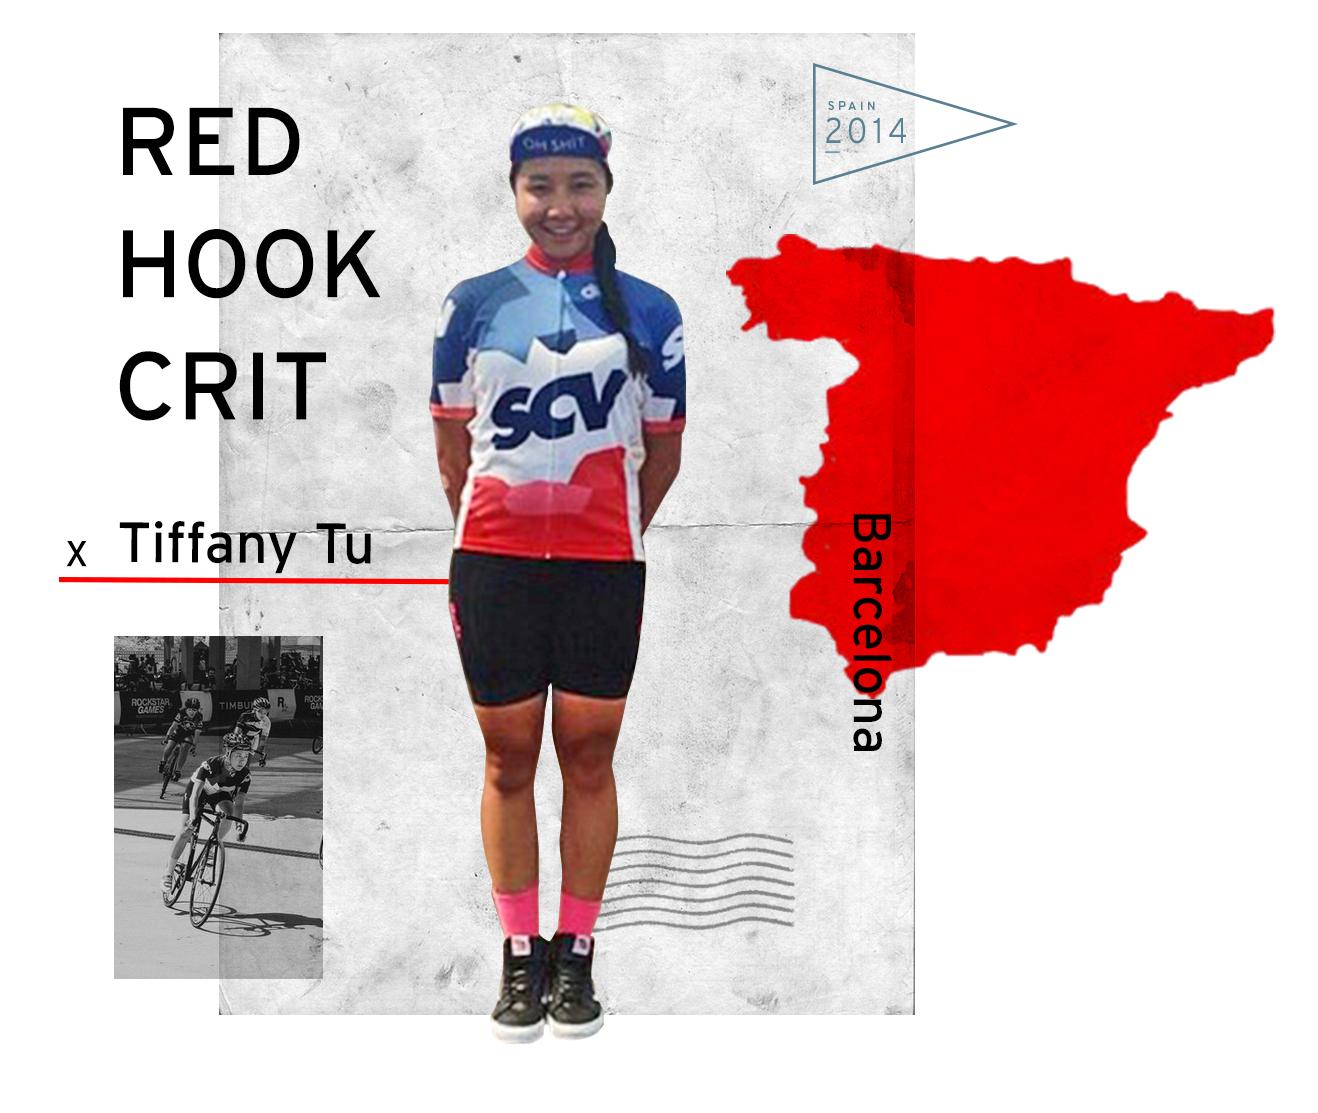 RED_HOOK_CRIT.jpg